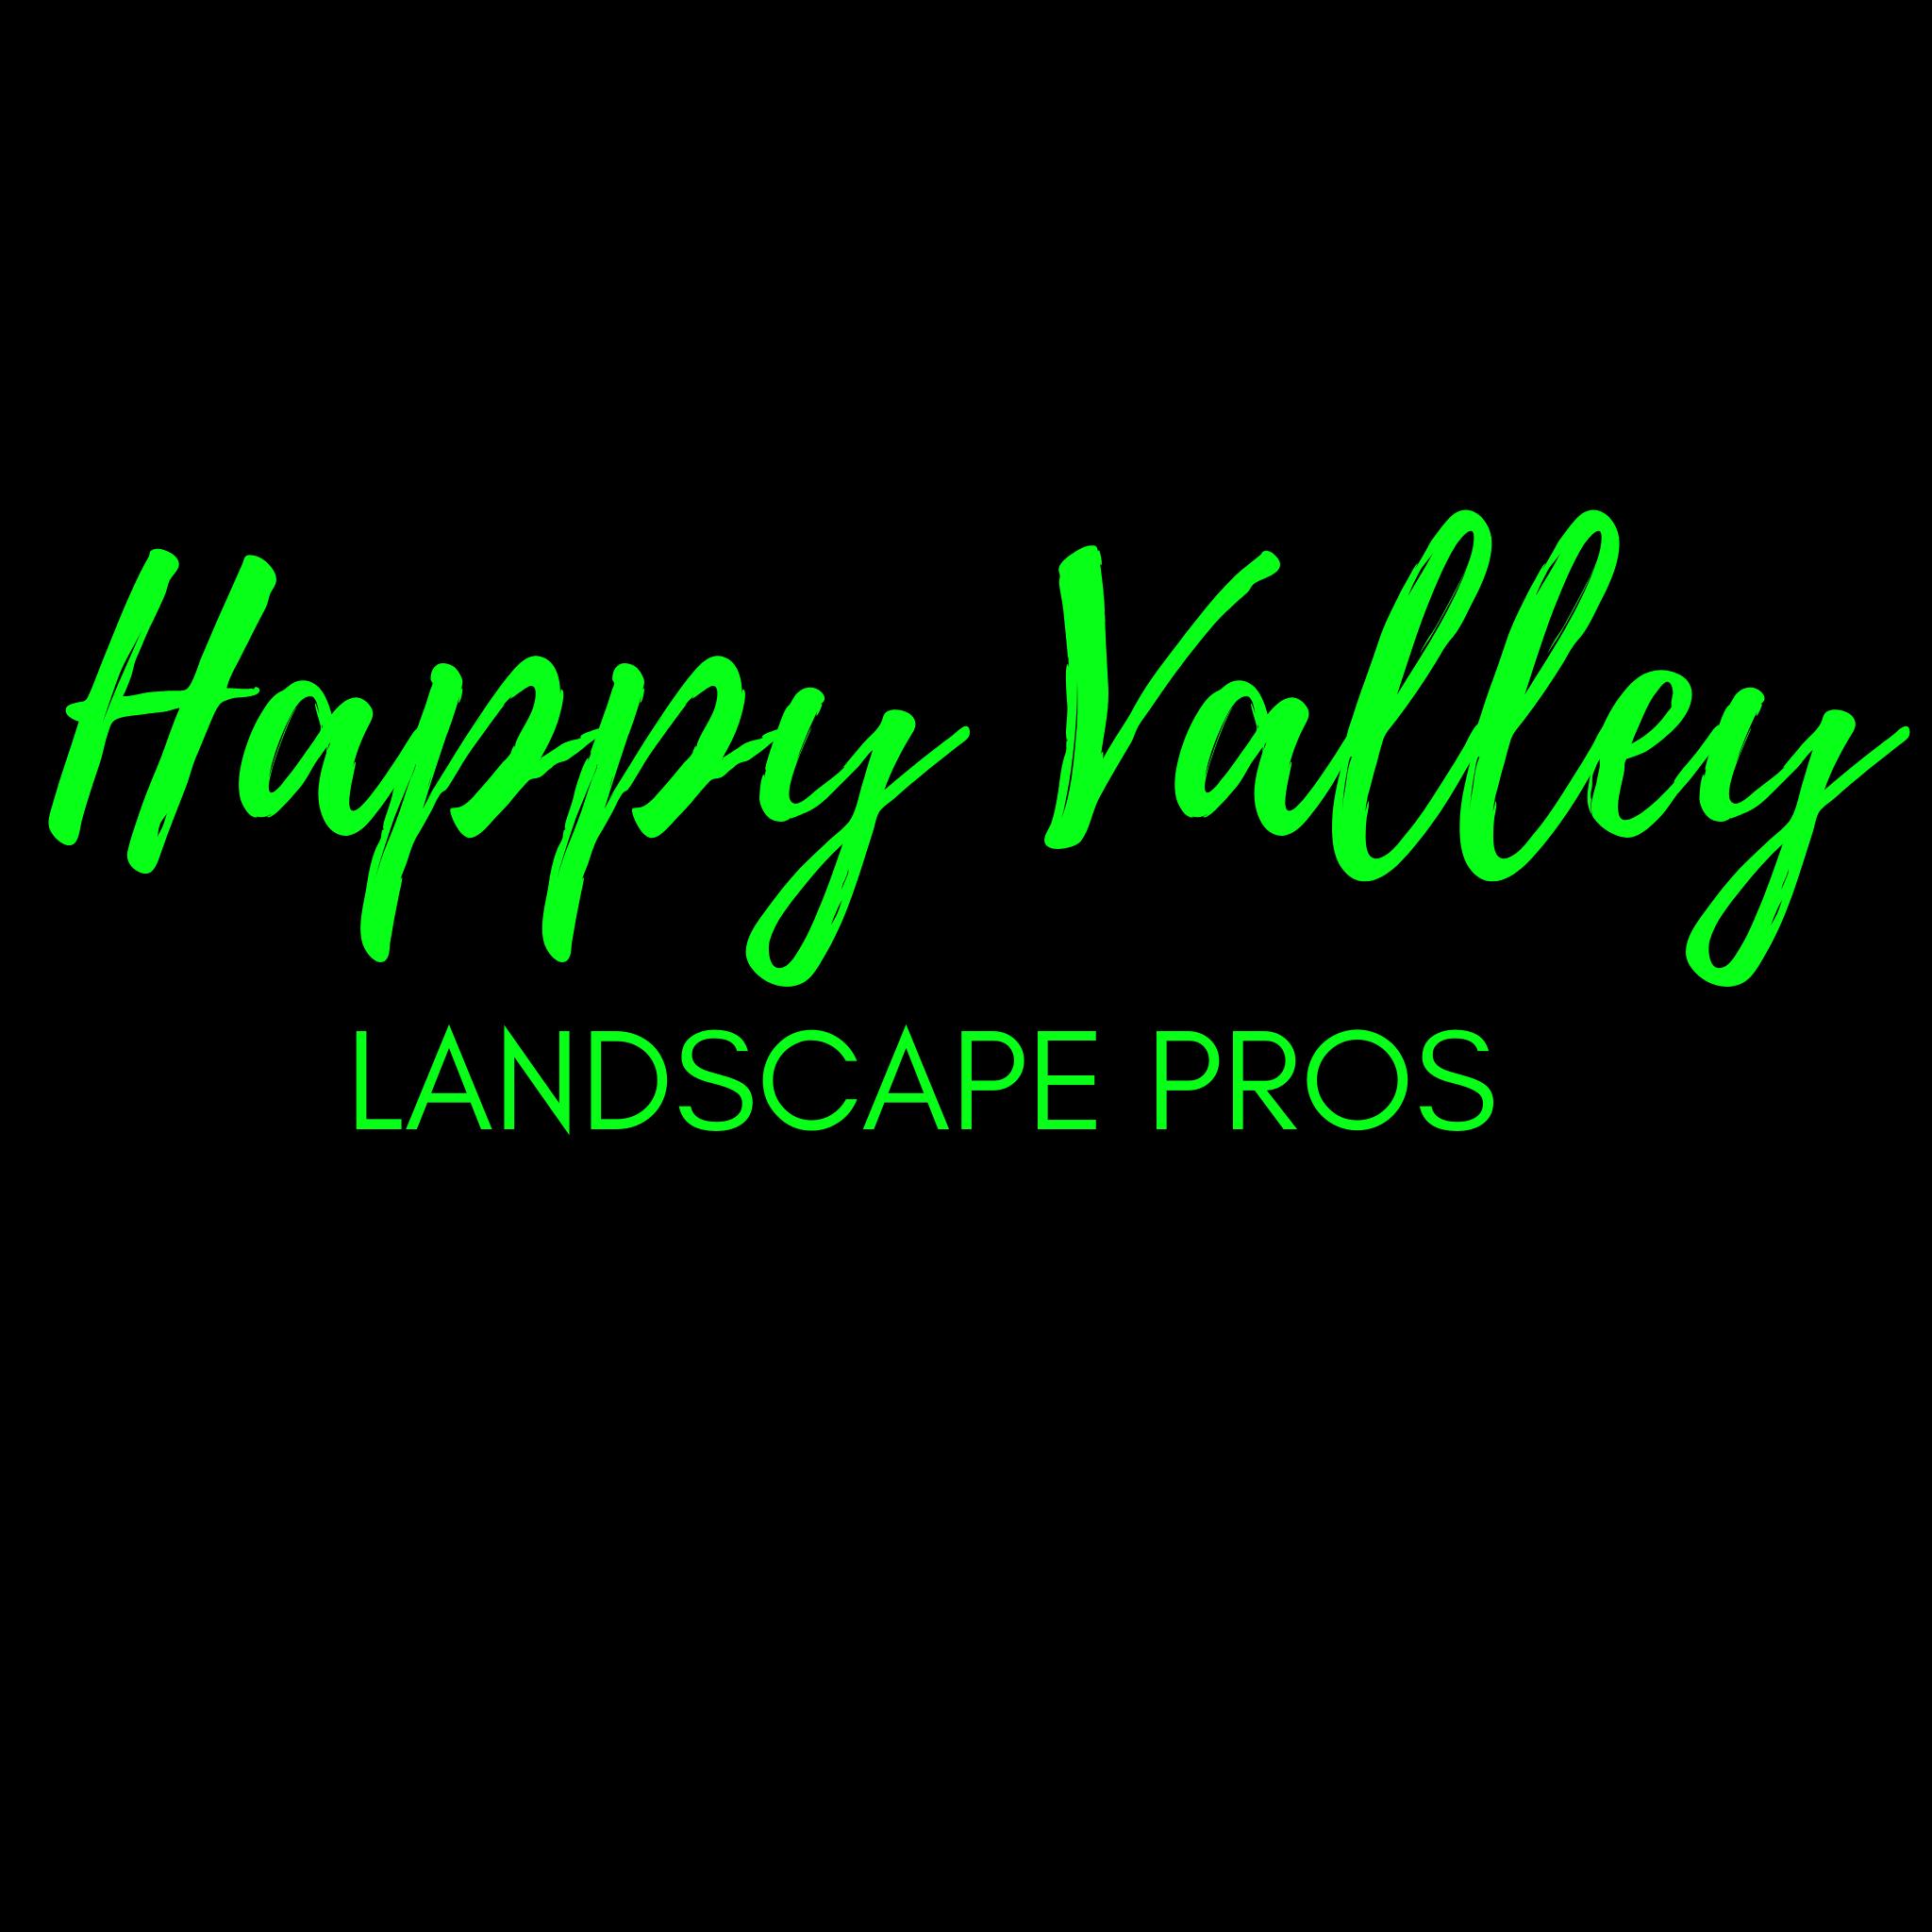 Happy Valley landscape pros logo